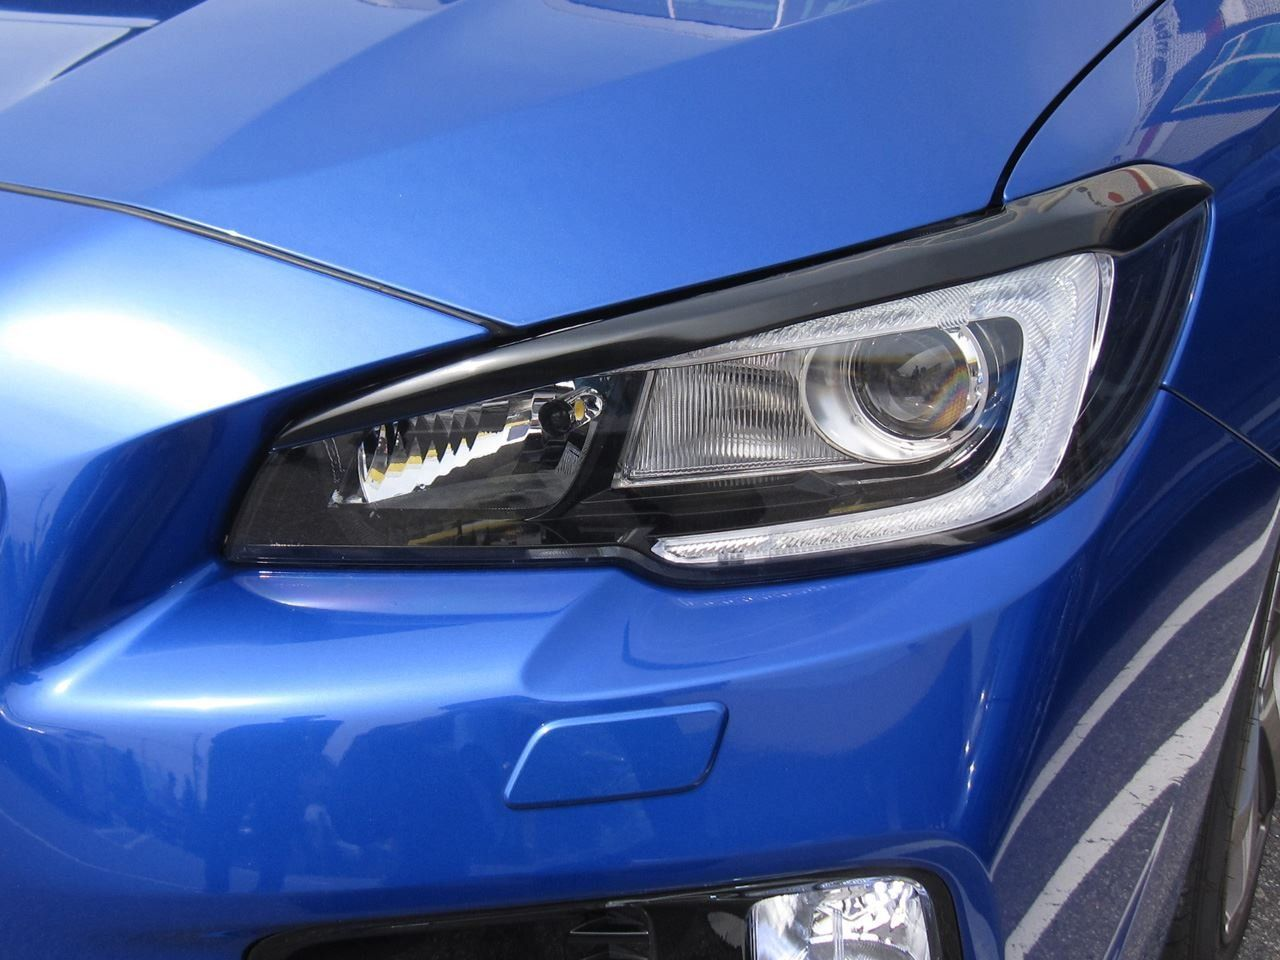 ams headlight eyebrows - 2015 wrx / 2015 sti - headlights